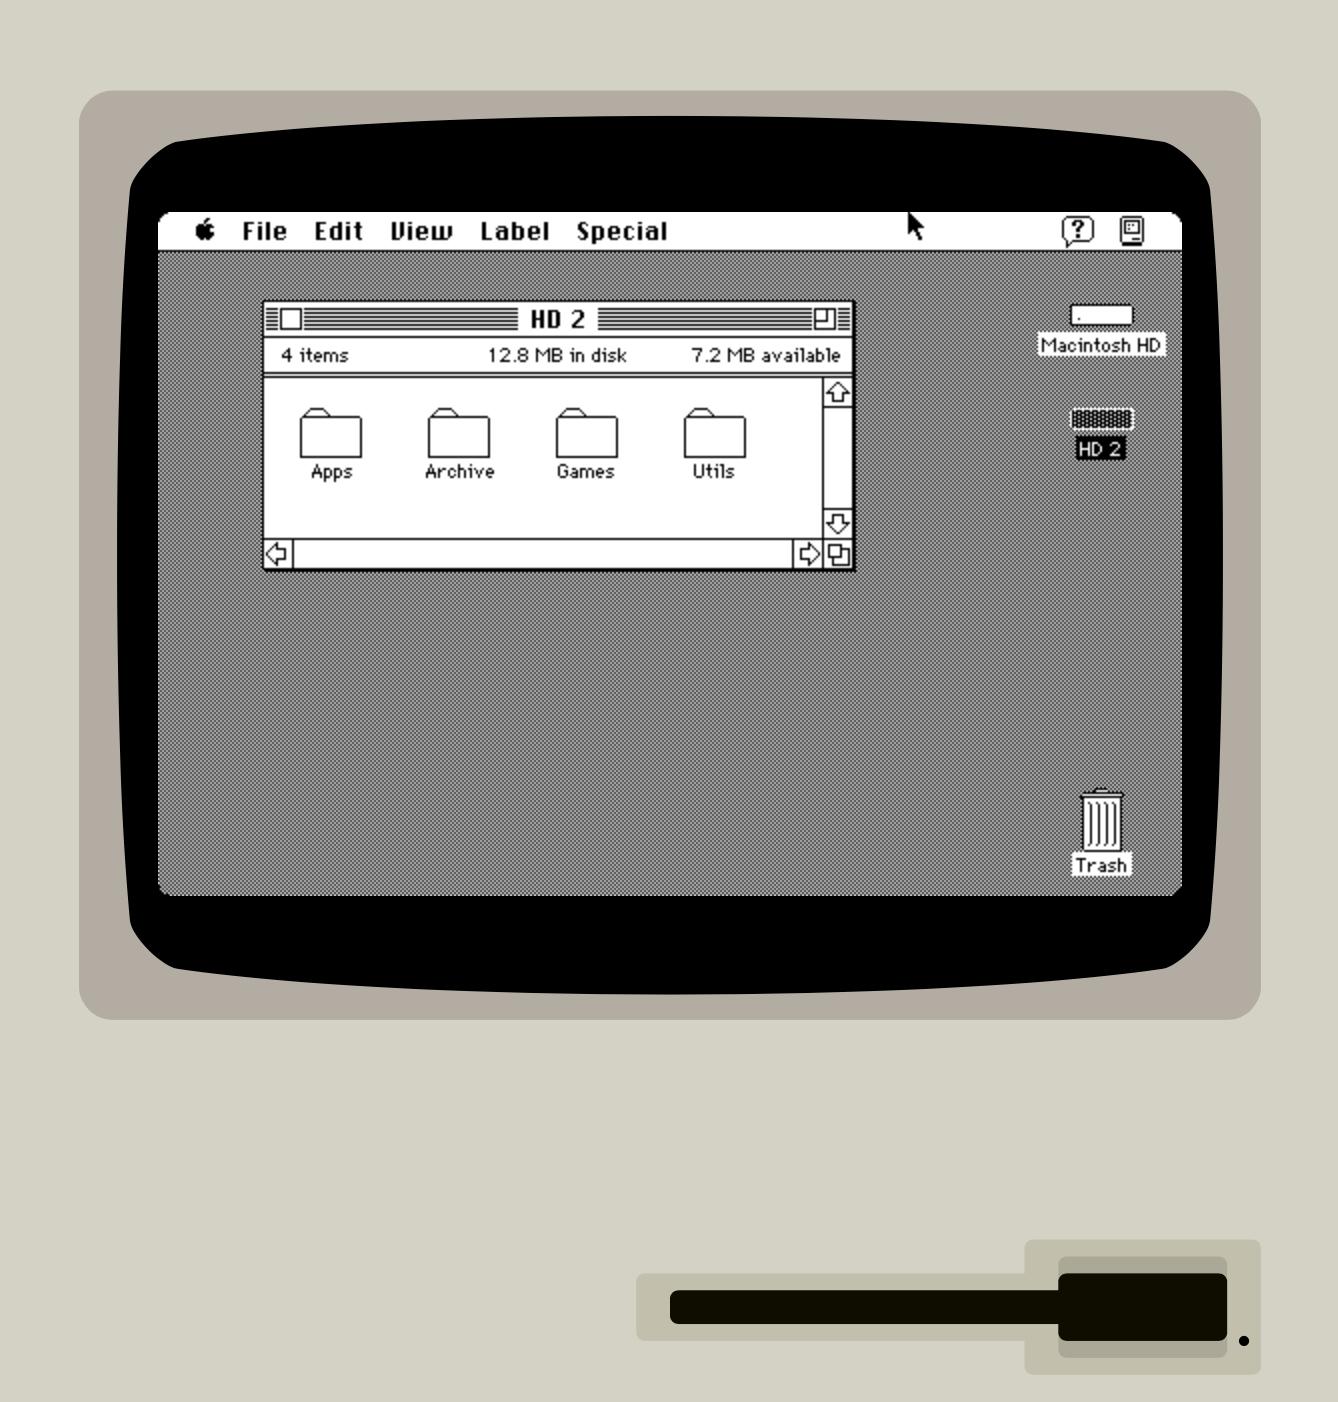 windows 98 emulator for mac free